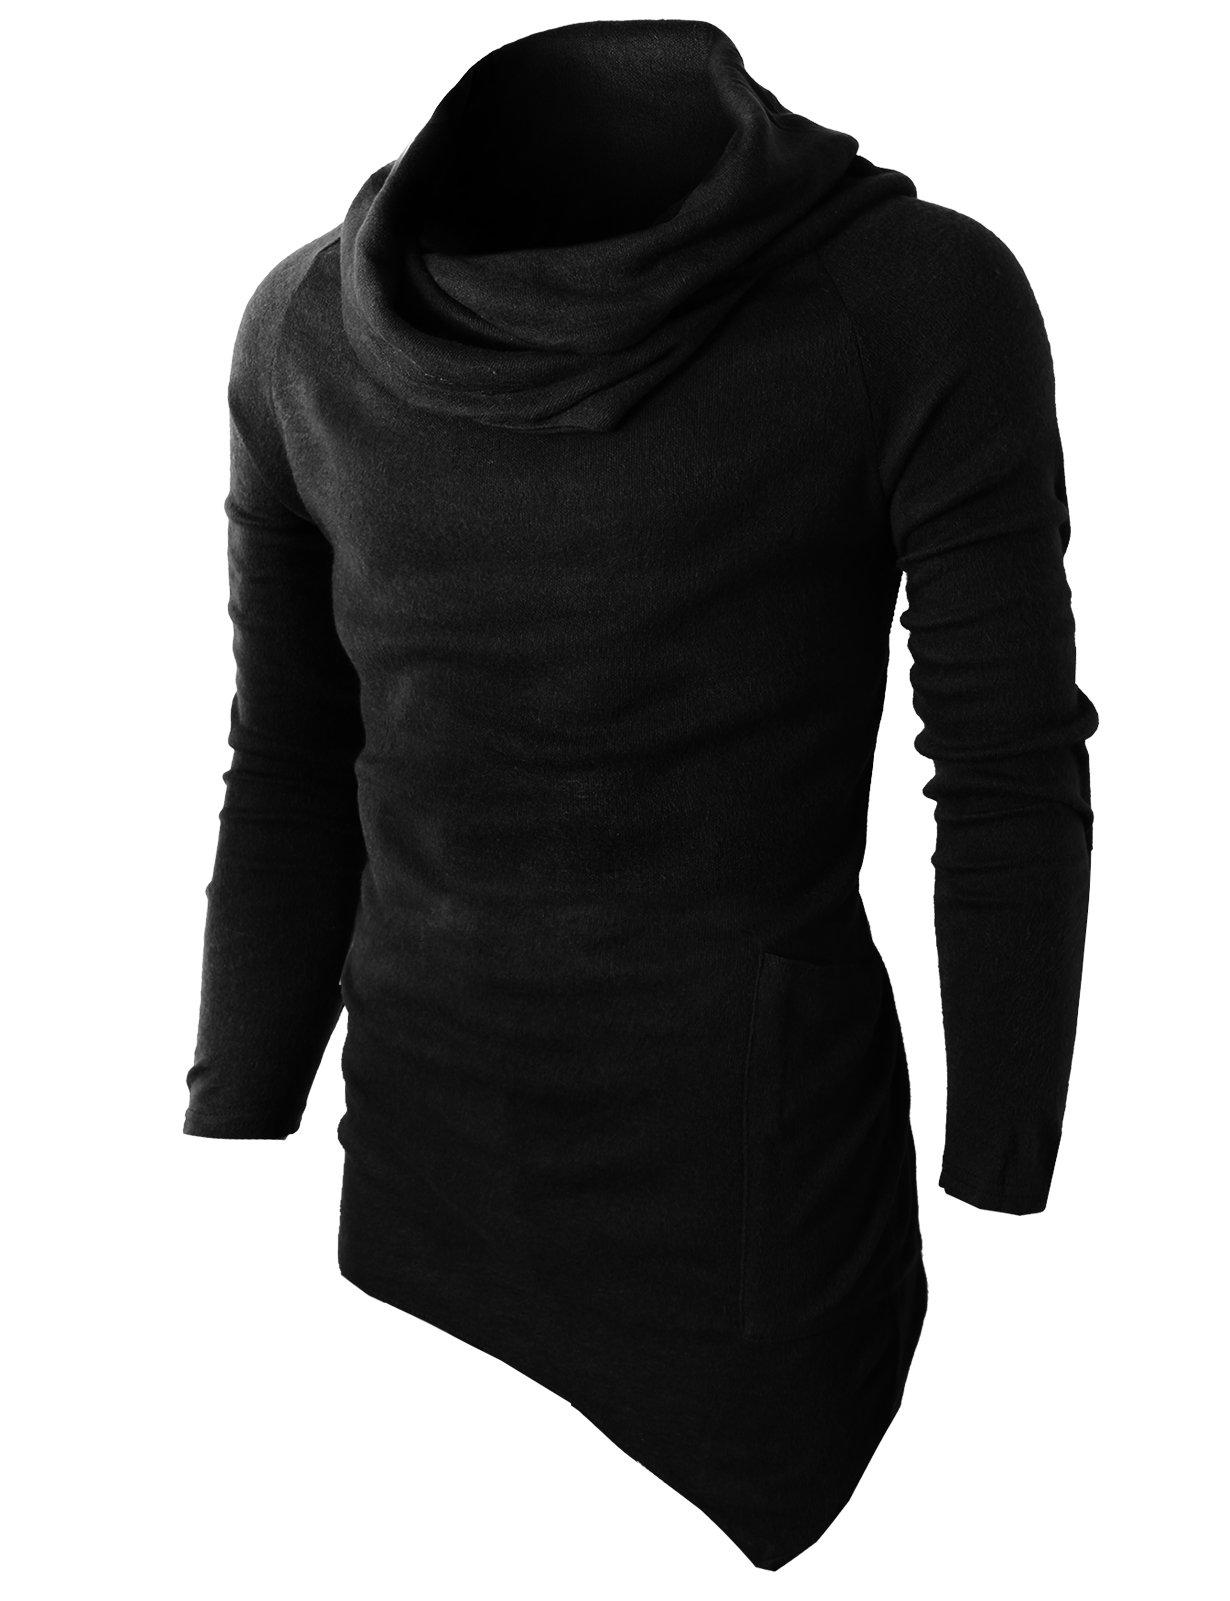 H2H Mens Casual Turtleneck Slim Fit Pullover Sweater Oblique Line Bottom Edge BLACK US M/Asia L (KMTTL046)